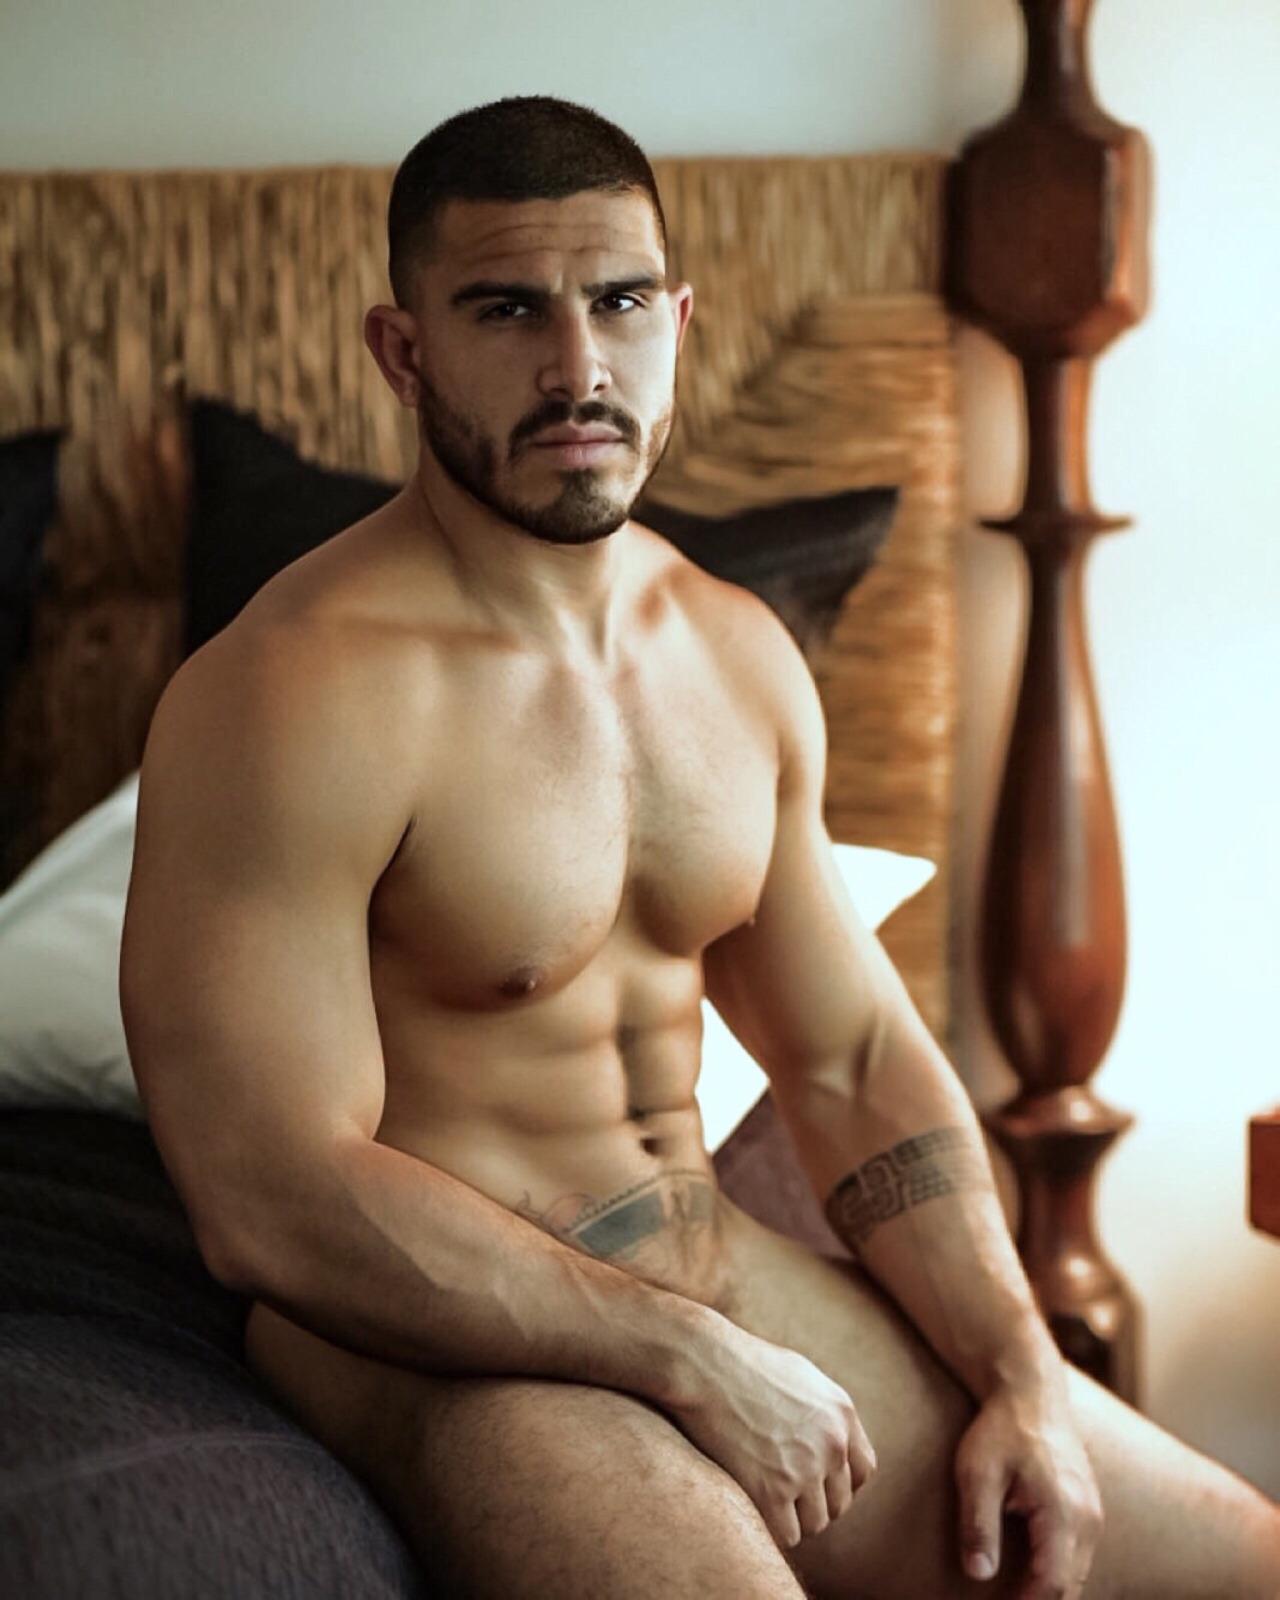 Nude arab men only